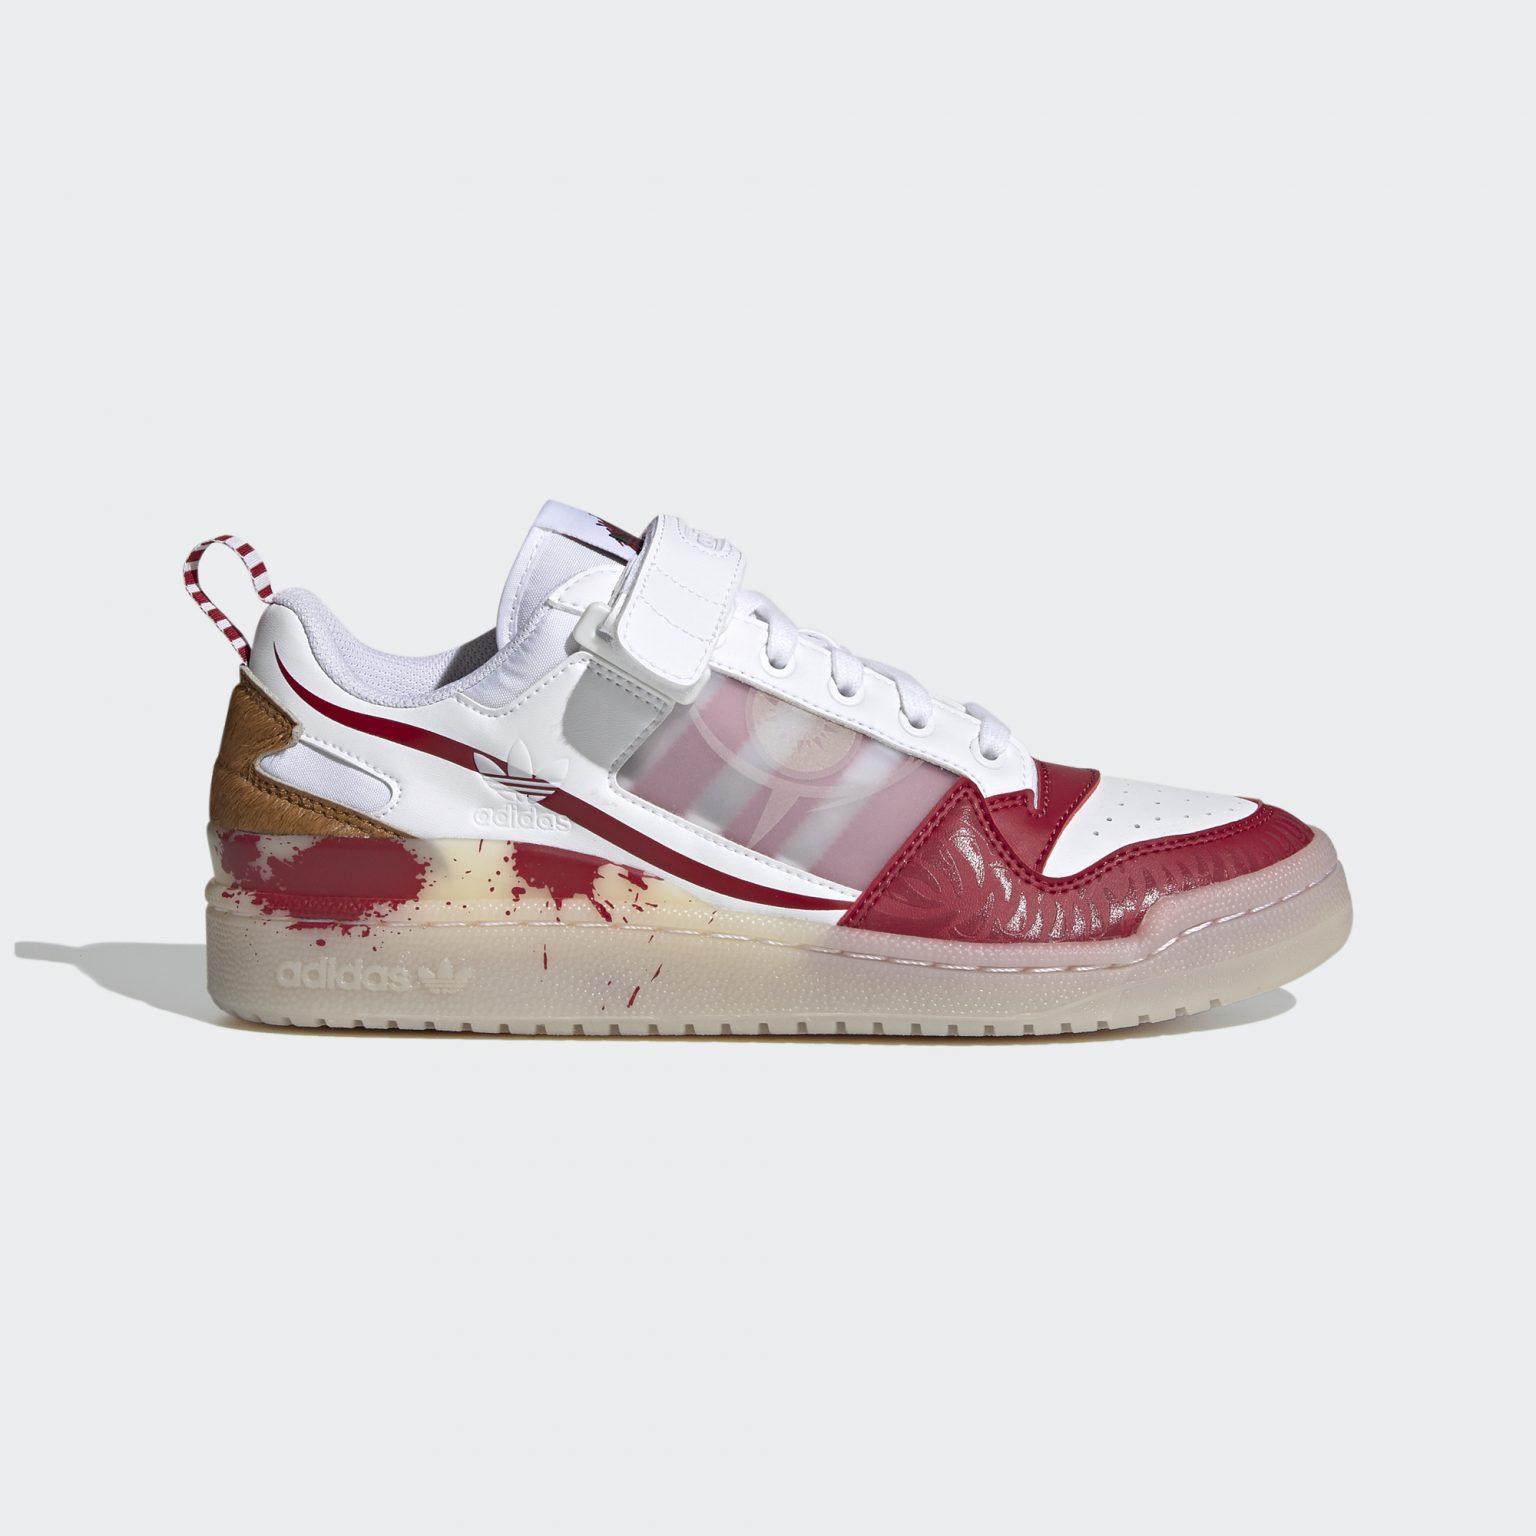 giay the thao hot tu 25-31.10.2020 adidas-halloween-elleman (2)